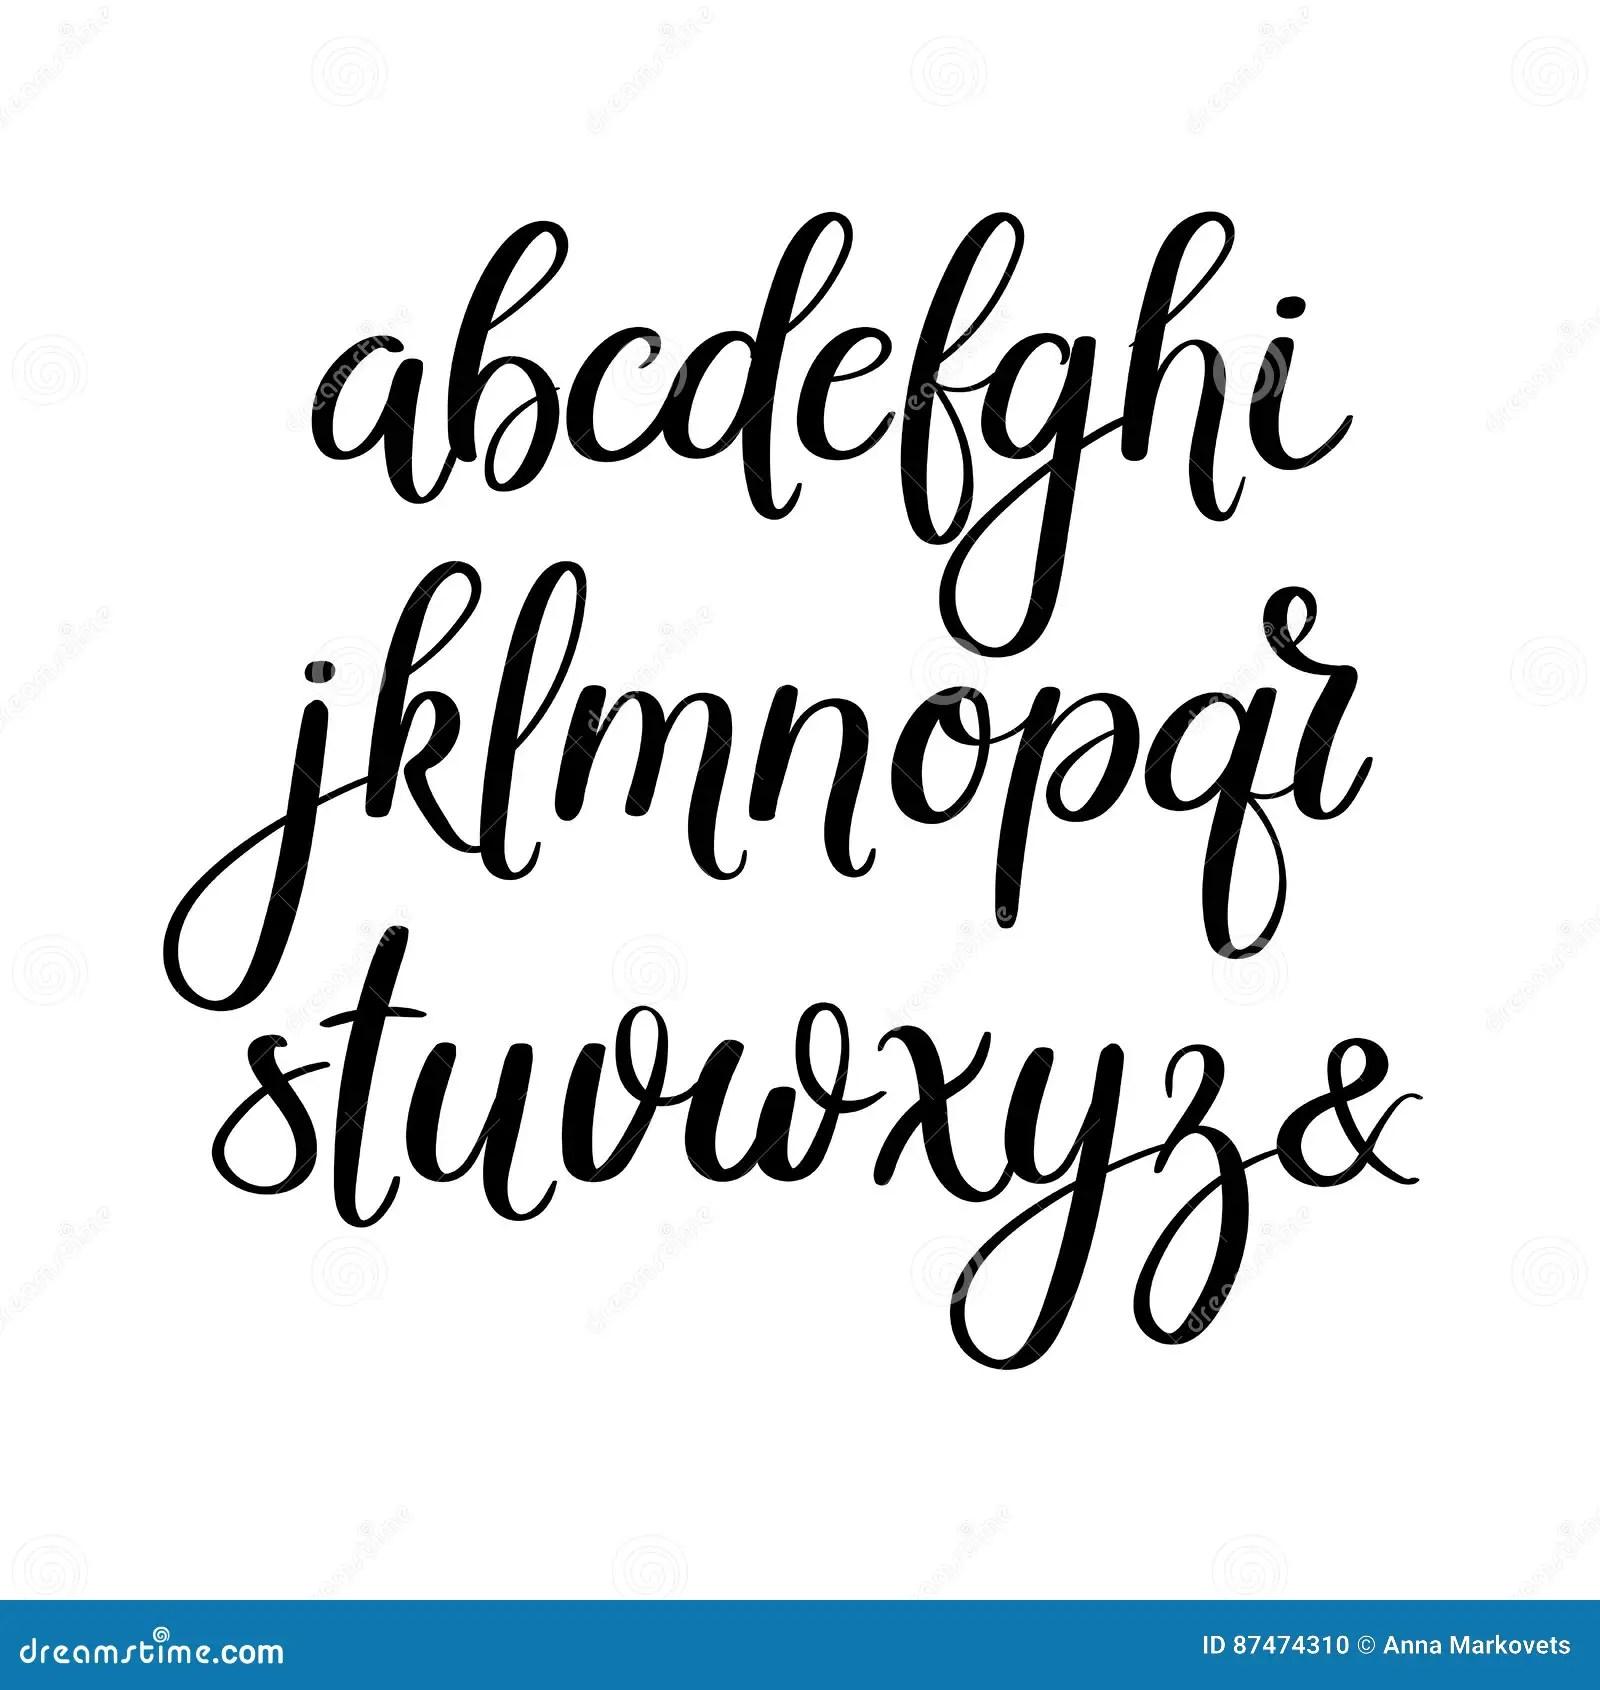 Handwritten Brush Letters. ABC. Modern Calligraphy. Hand